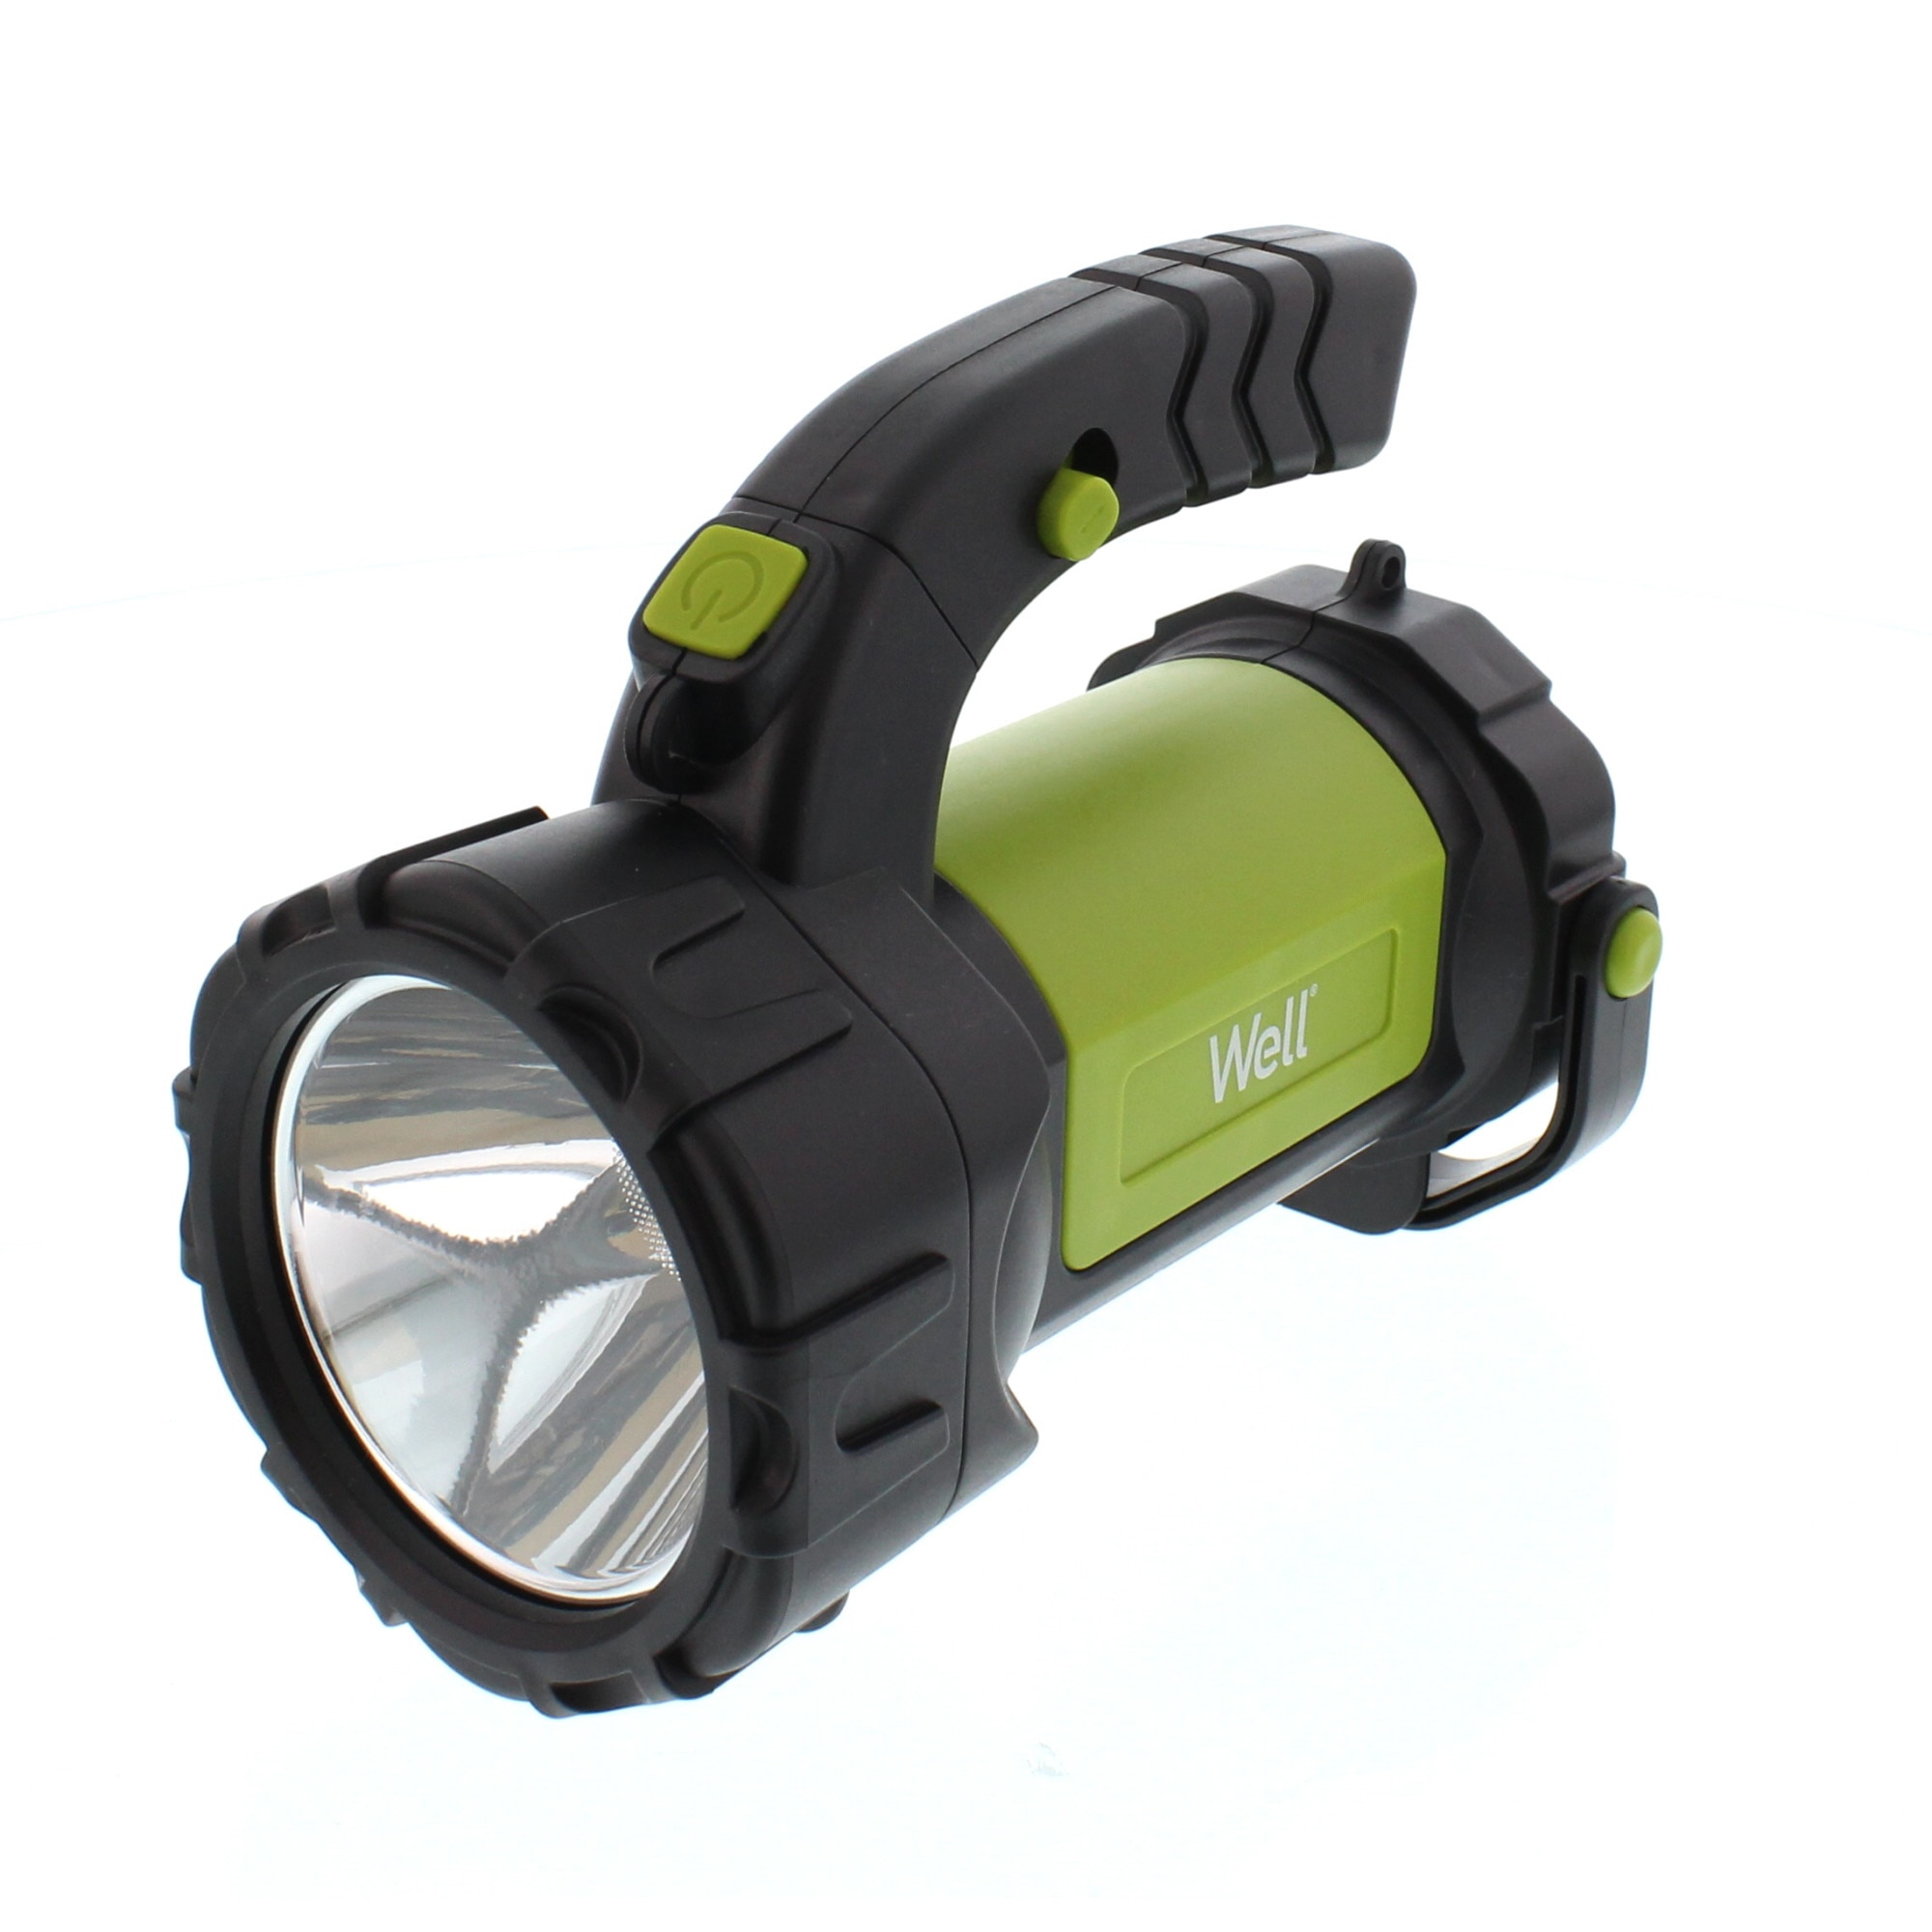 Fotografie Lanterna LED industriala reincarcabila Well Strudy, T6+COB, 10W, 350 lm, Li-Ion 1200mAh